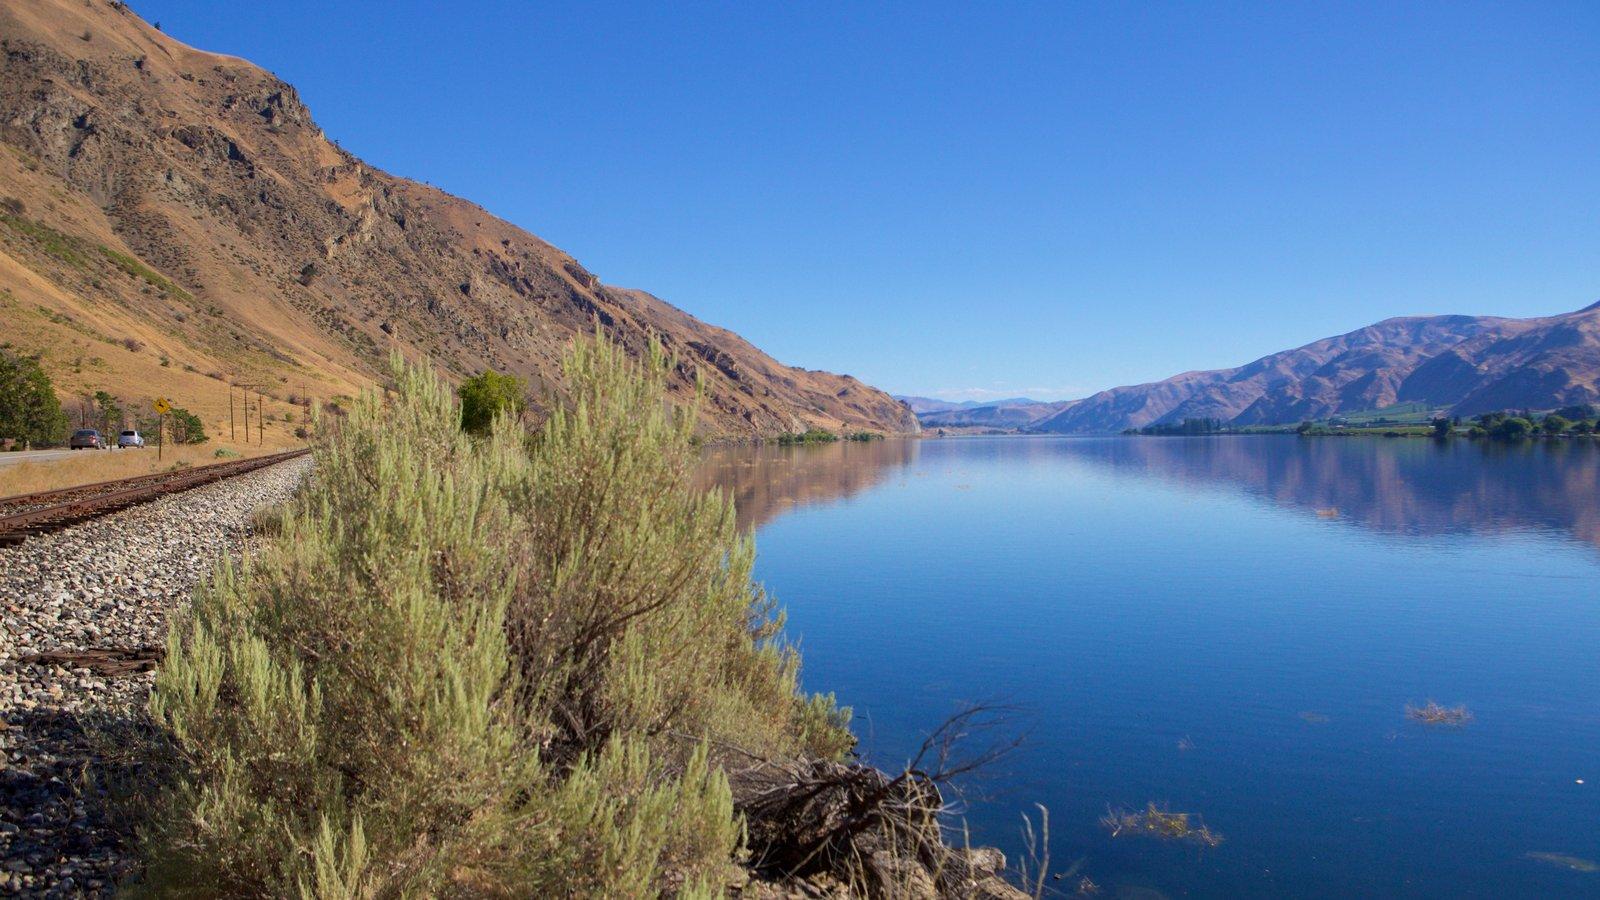 Wenatchee - Lake Chelan mostrando um lago ou charco